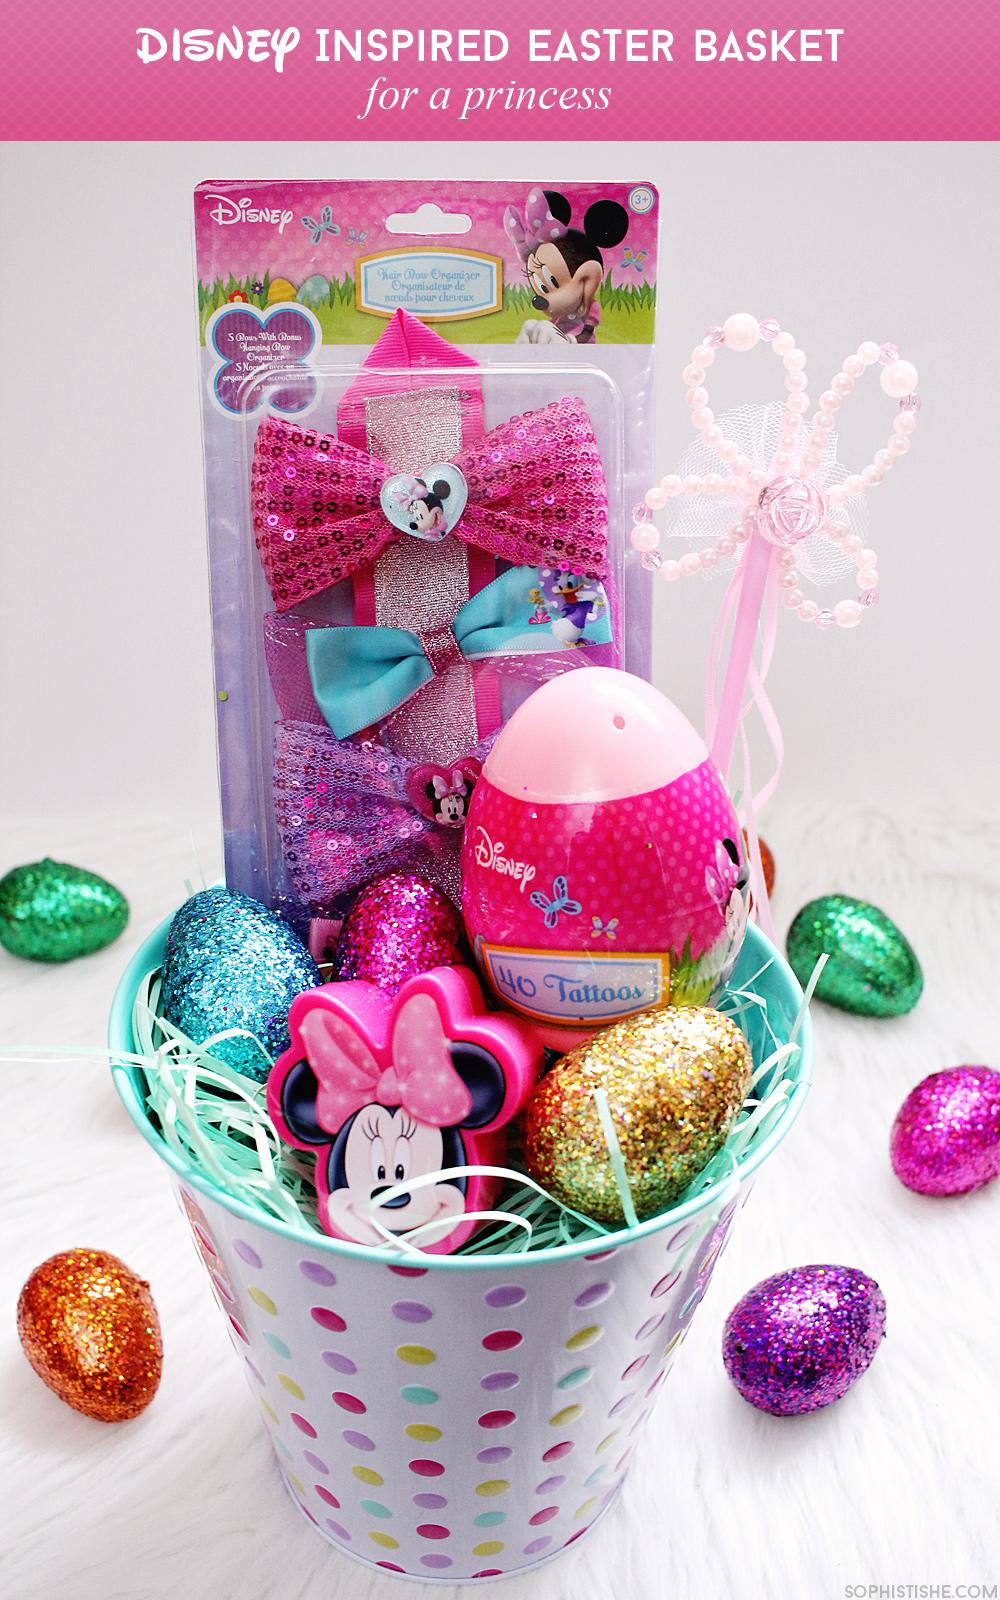 Disney Easter Basket & Cheap Souvenir Ideas!